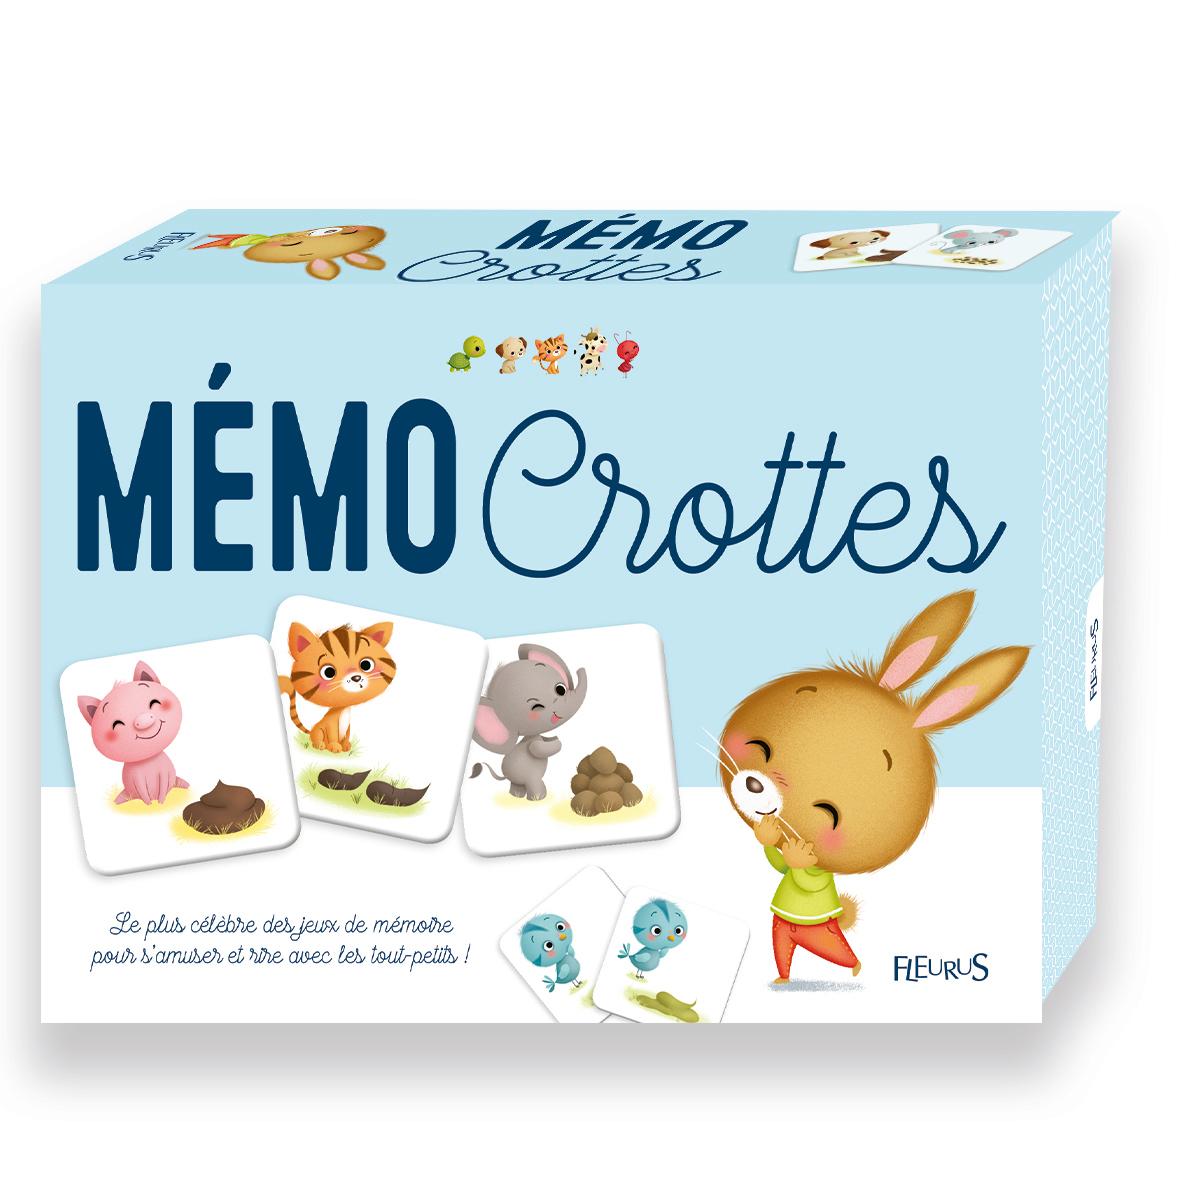 MEMO CROTTES